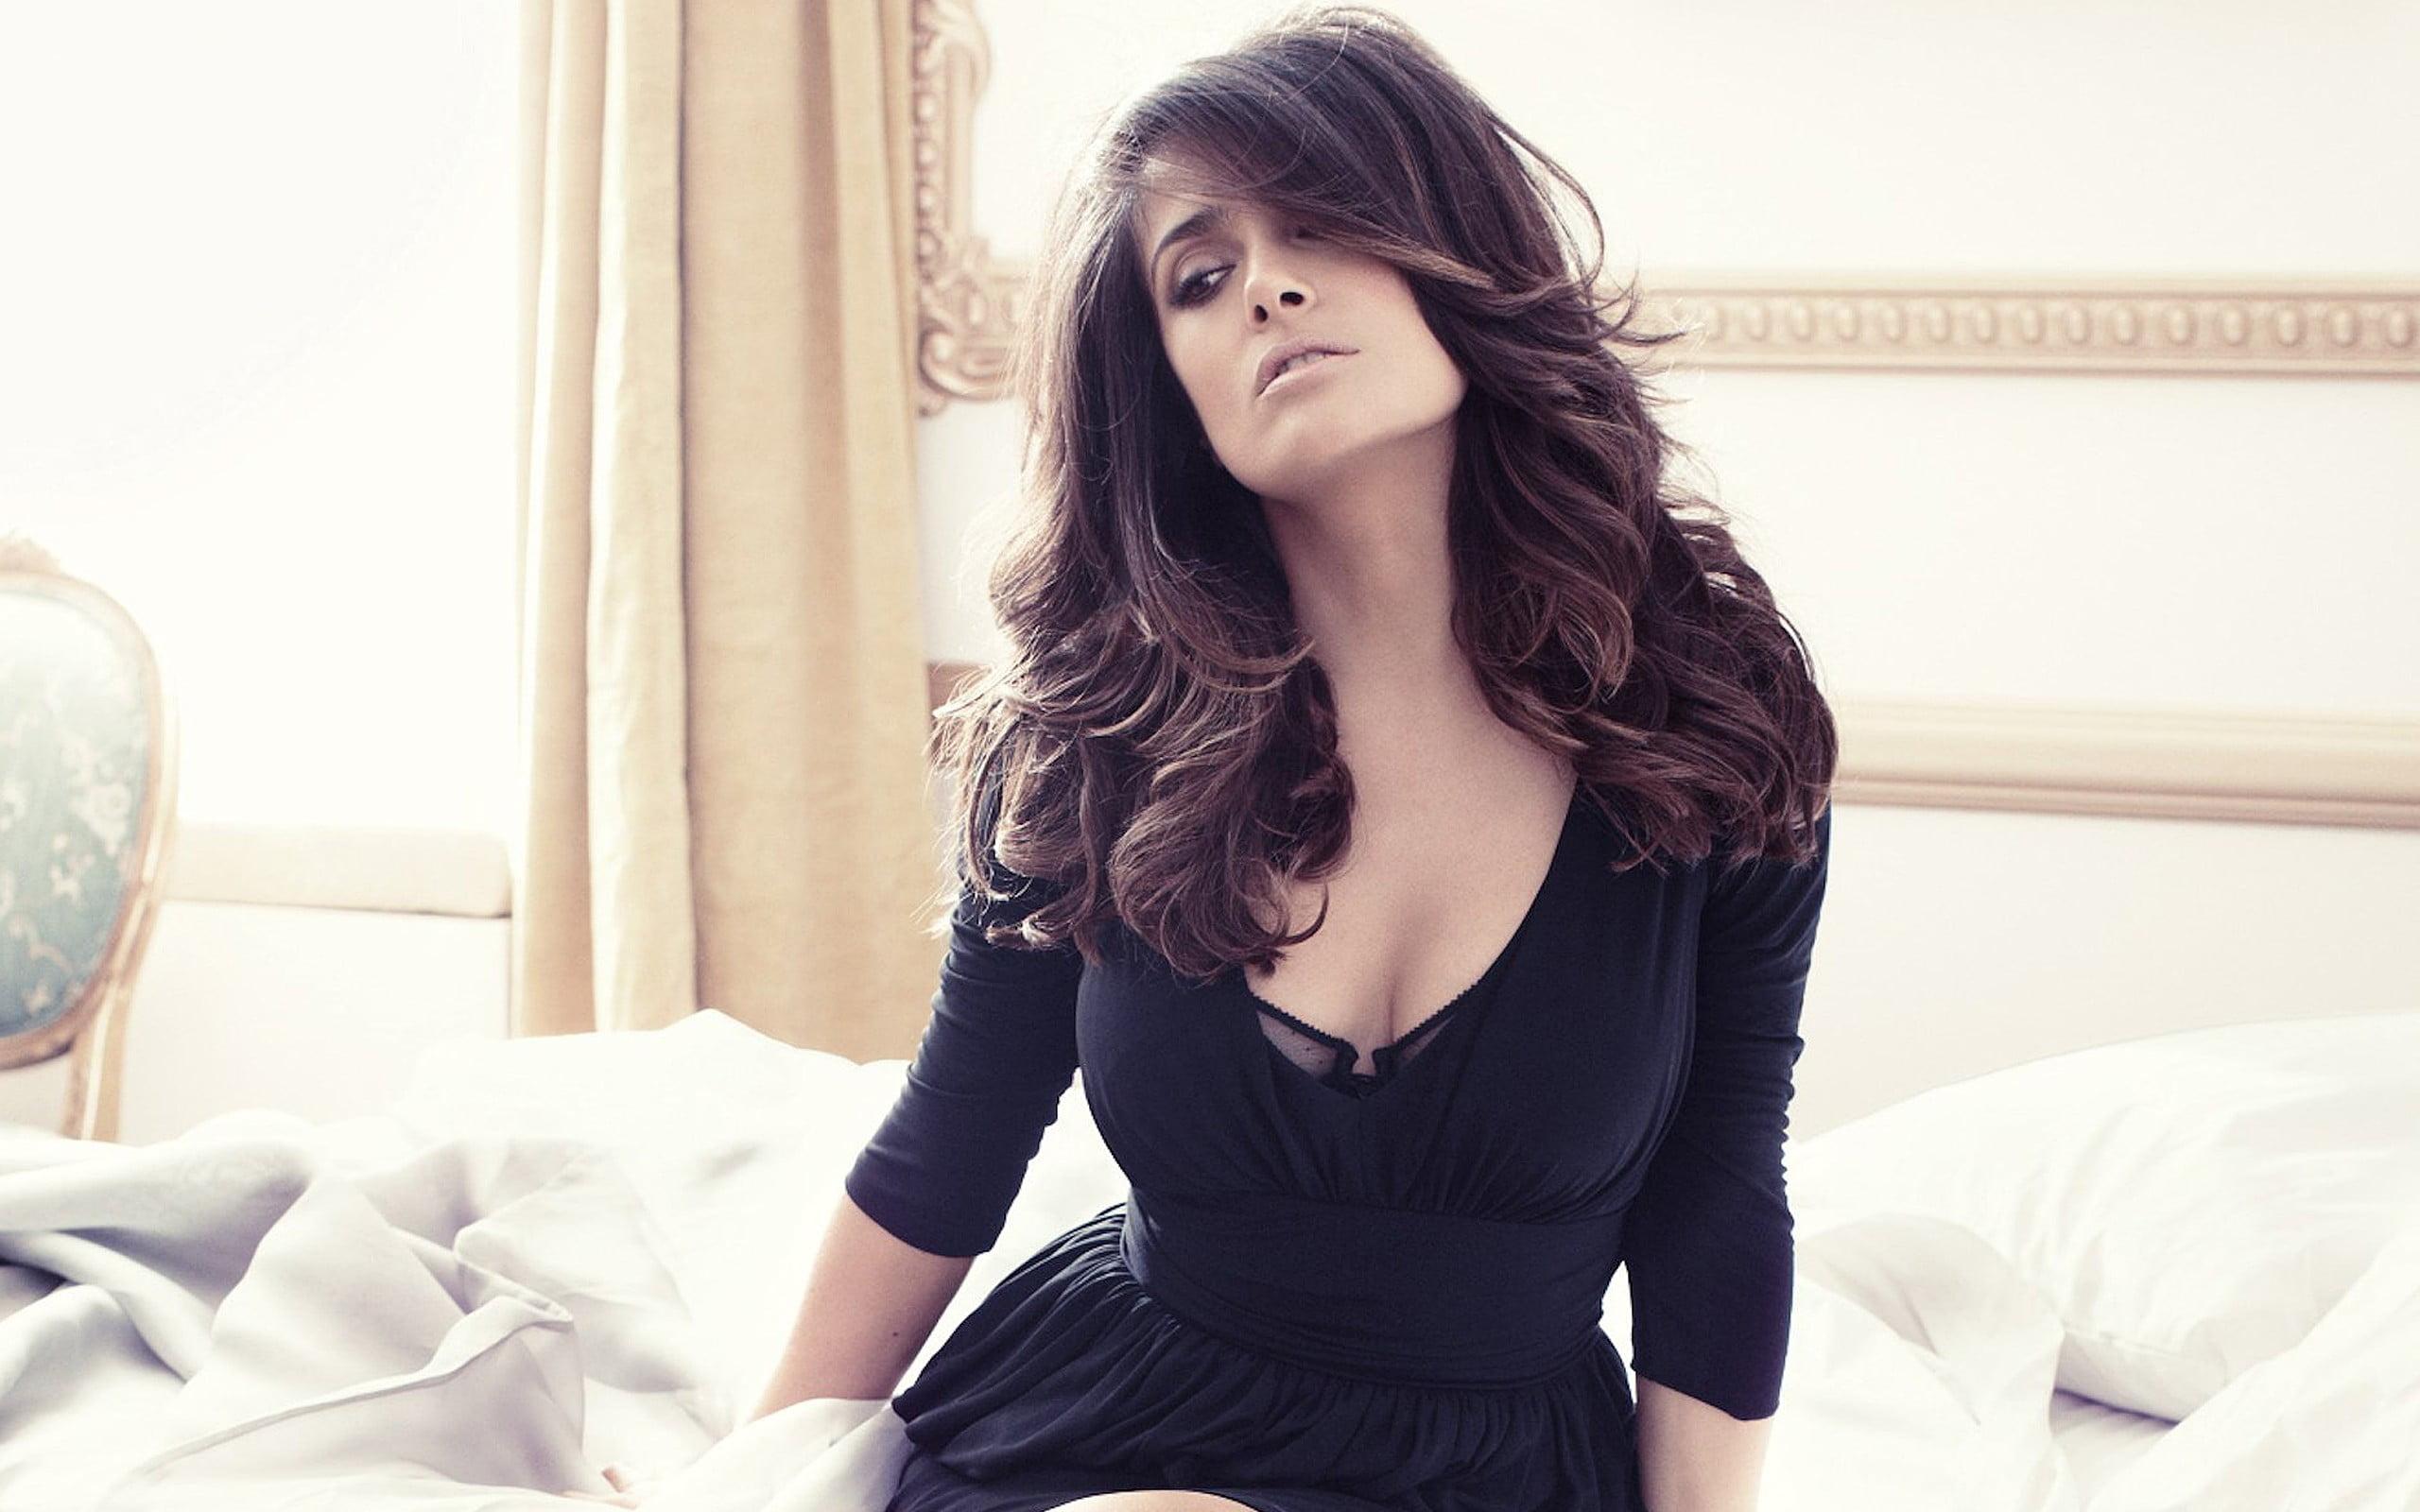 Salma Hayek brunette actress Latinas HD wallpaper Wallpaper Flare 2560x1600